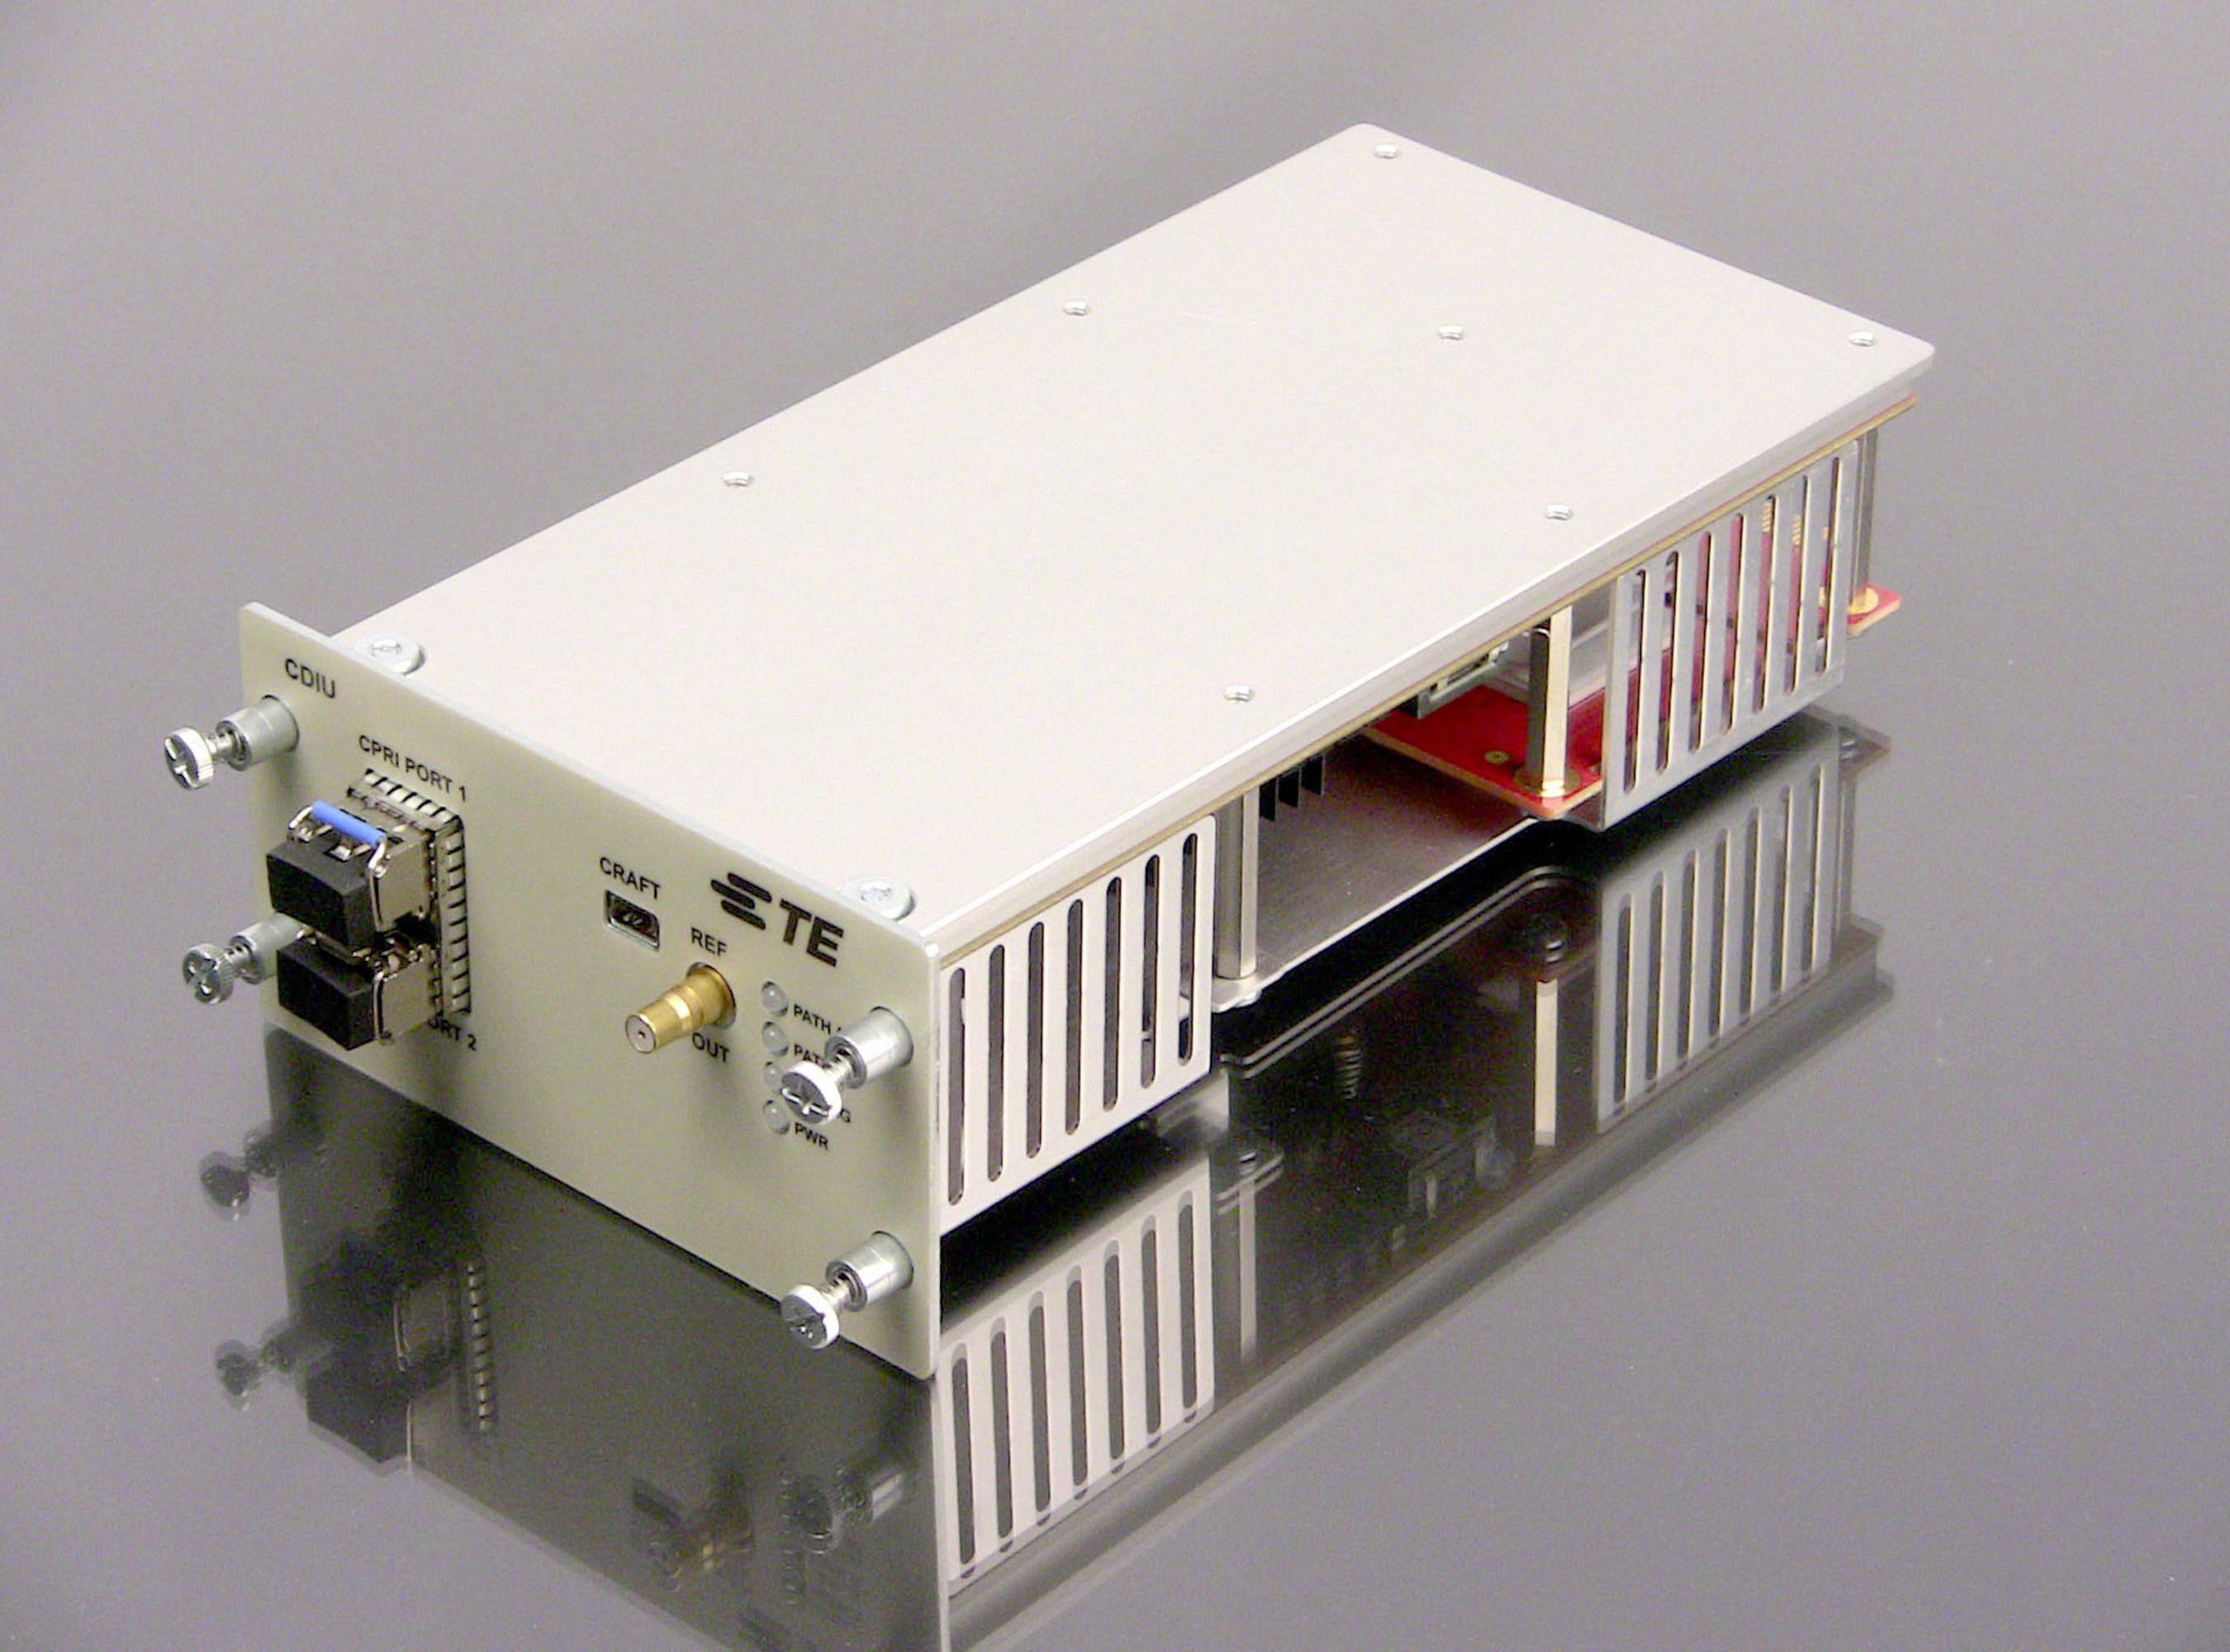 CPRI digital interface unit from Alcatel-Lucent for the TE FlexWave digital DAS Host